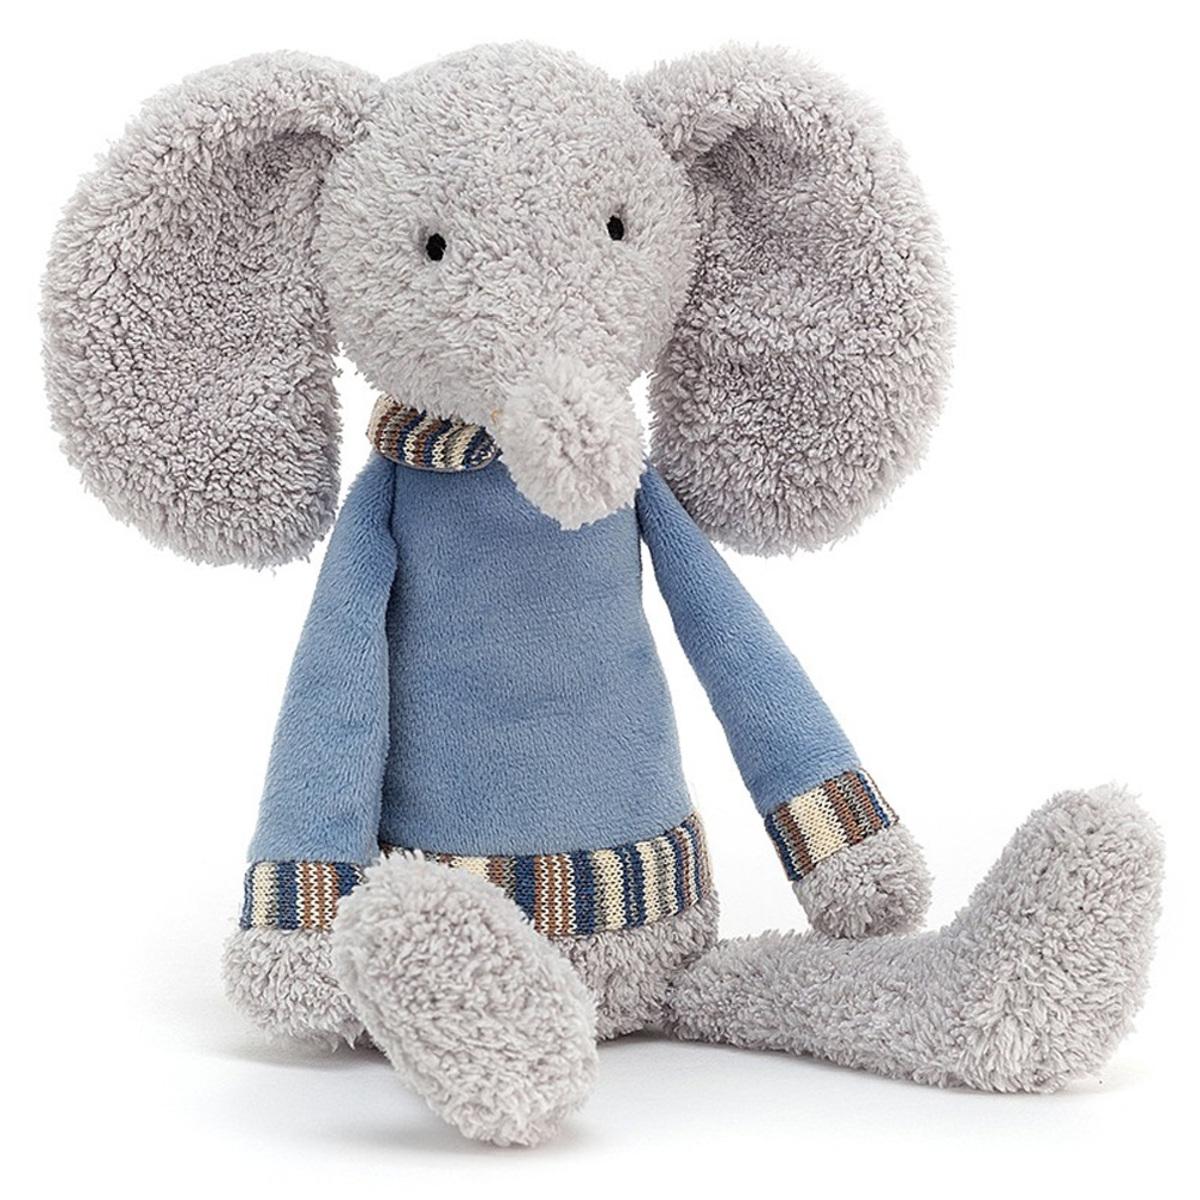 Peluche Lingley Elephant Peluche Eléphant 29 cm